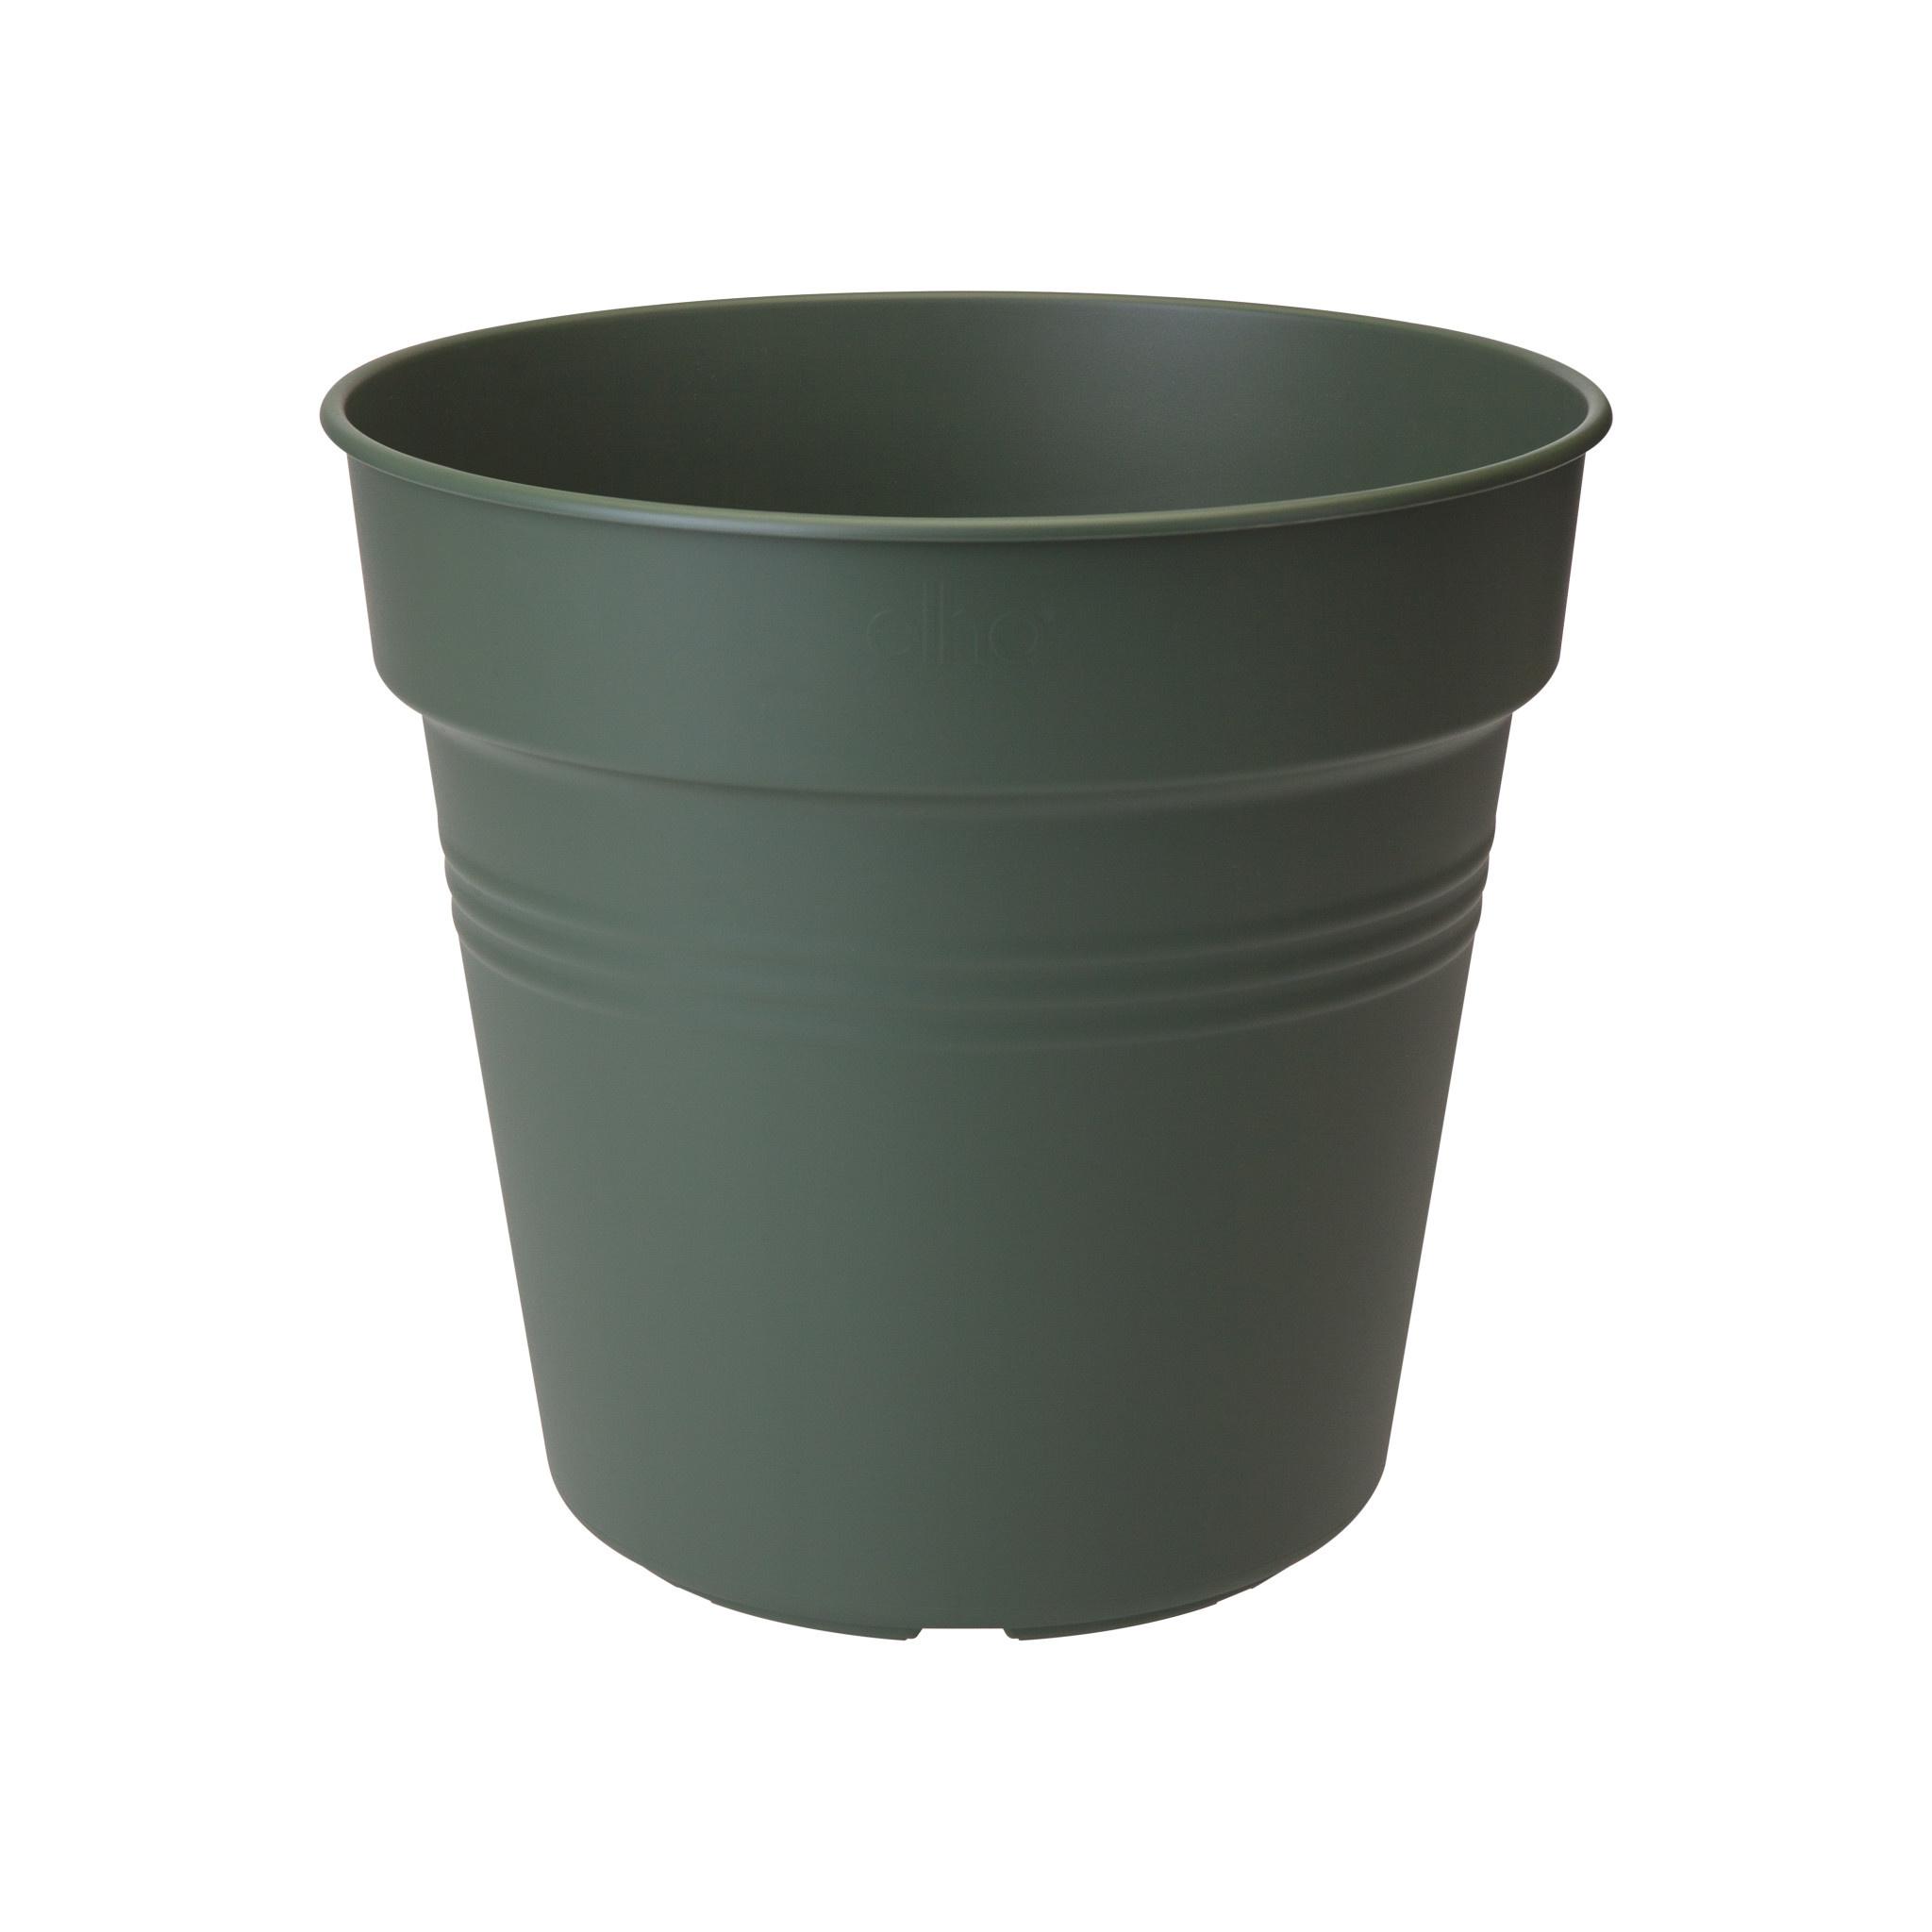 Elho 2019 Green Basics Kweekpot